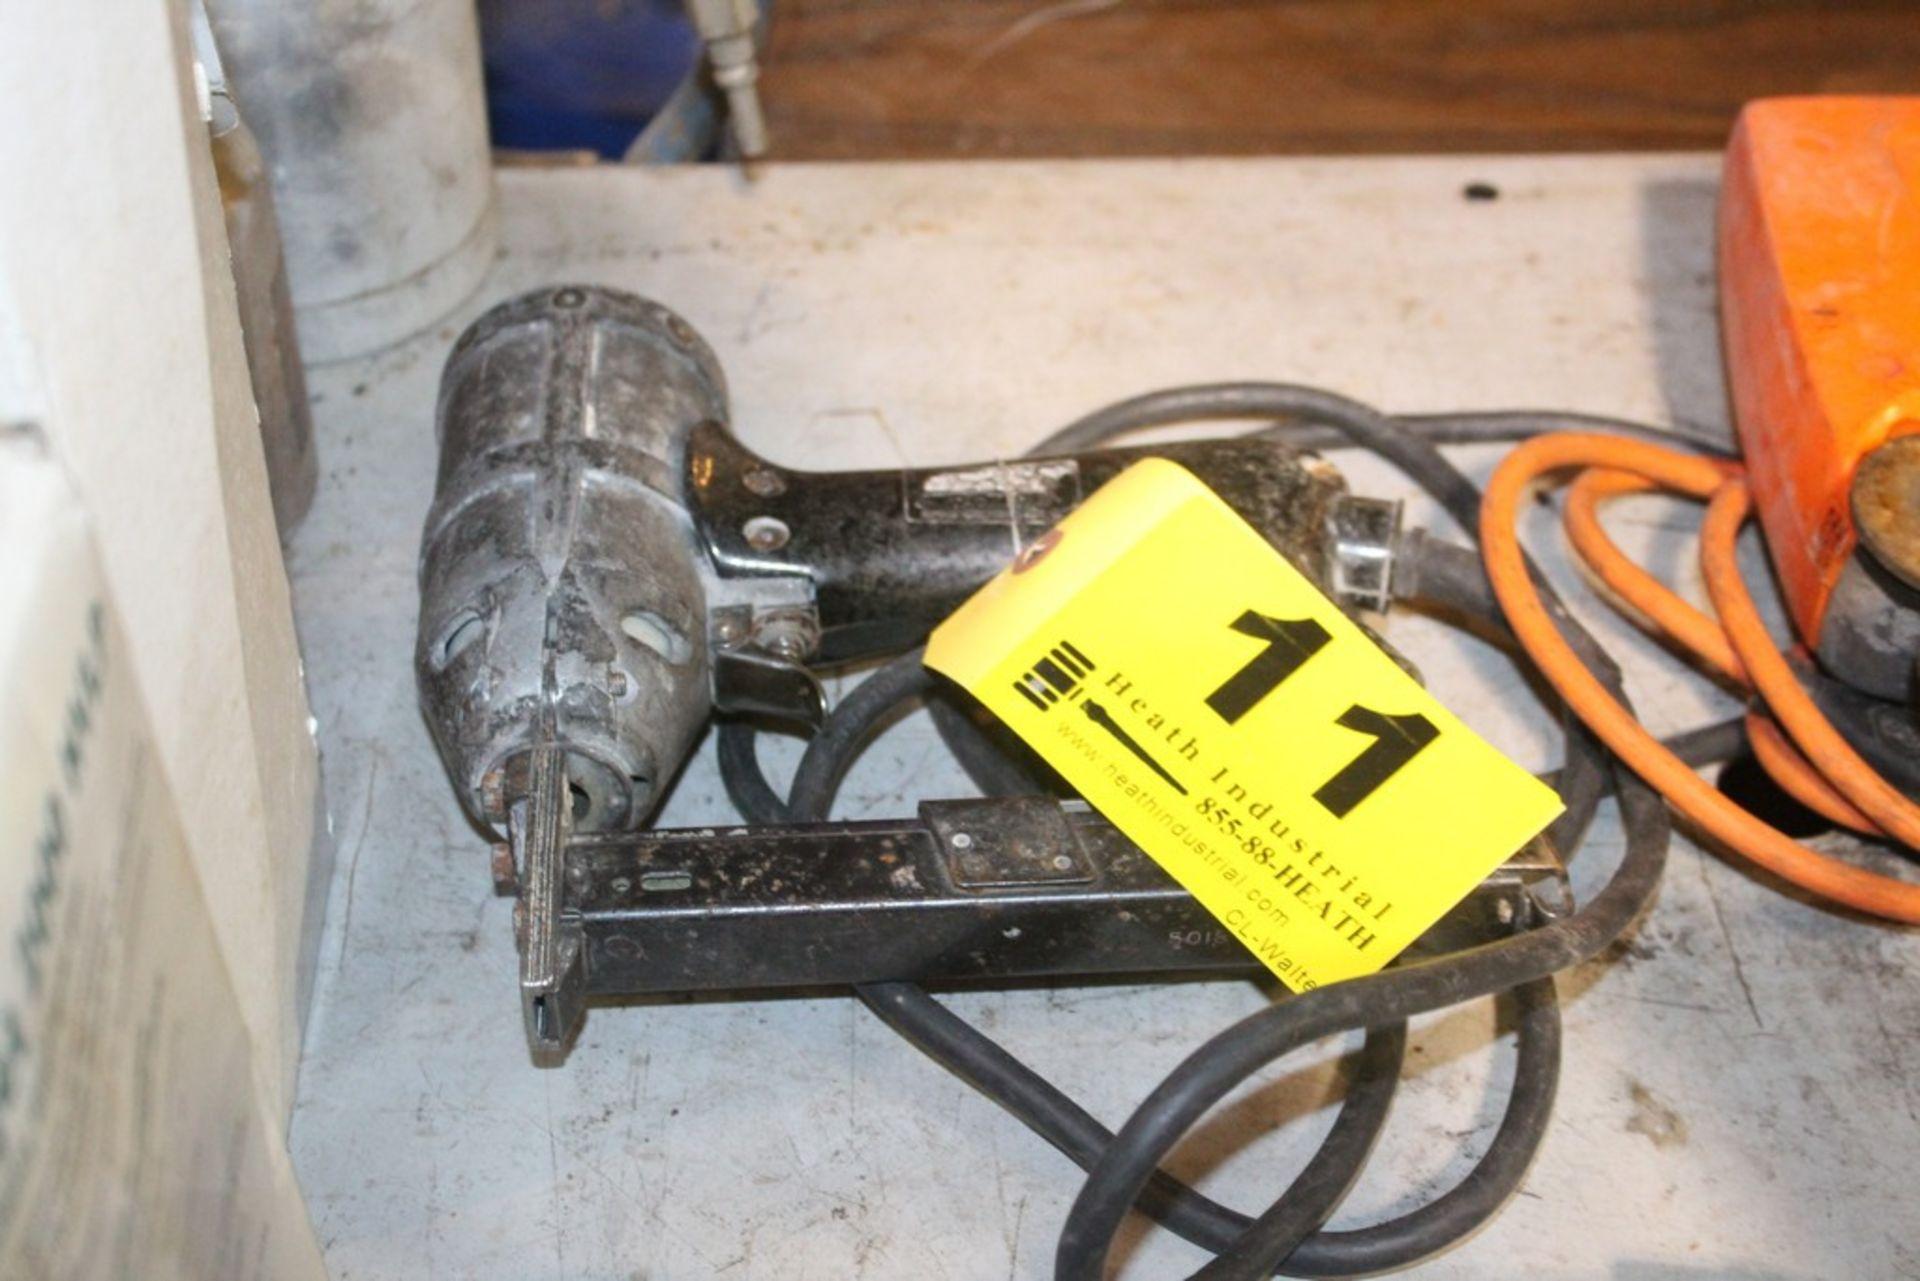 Lot 11 - EWB MODEL 5018 ELECTRIC STAPLER